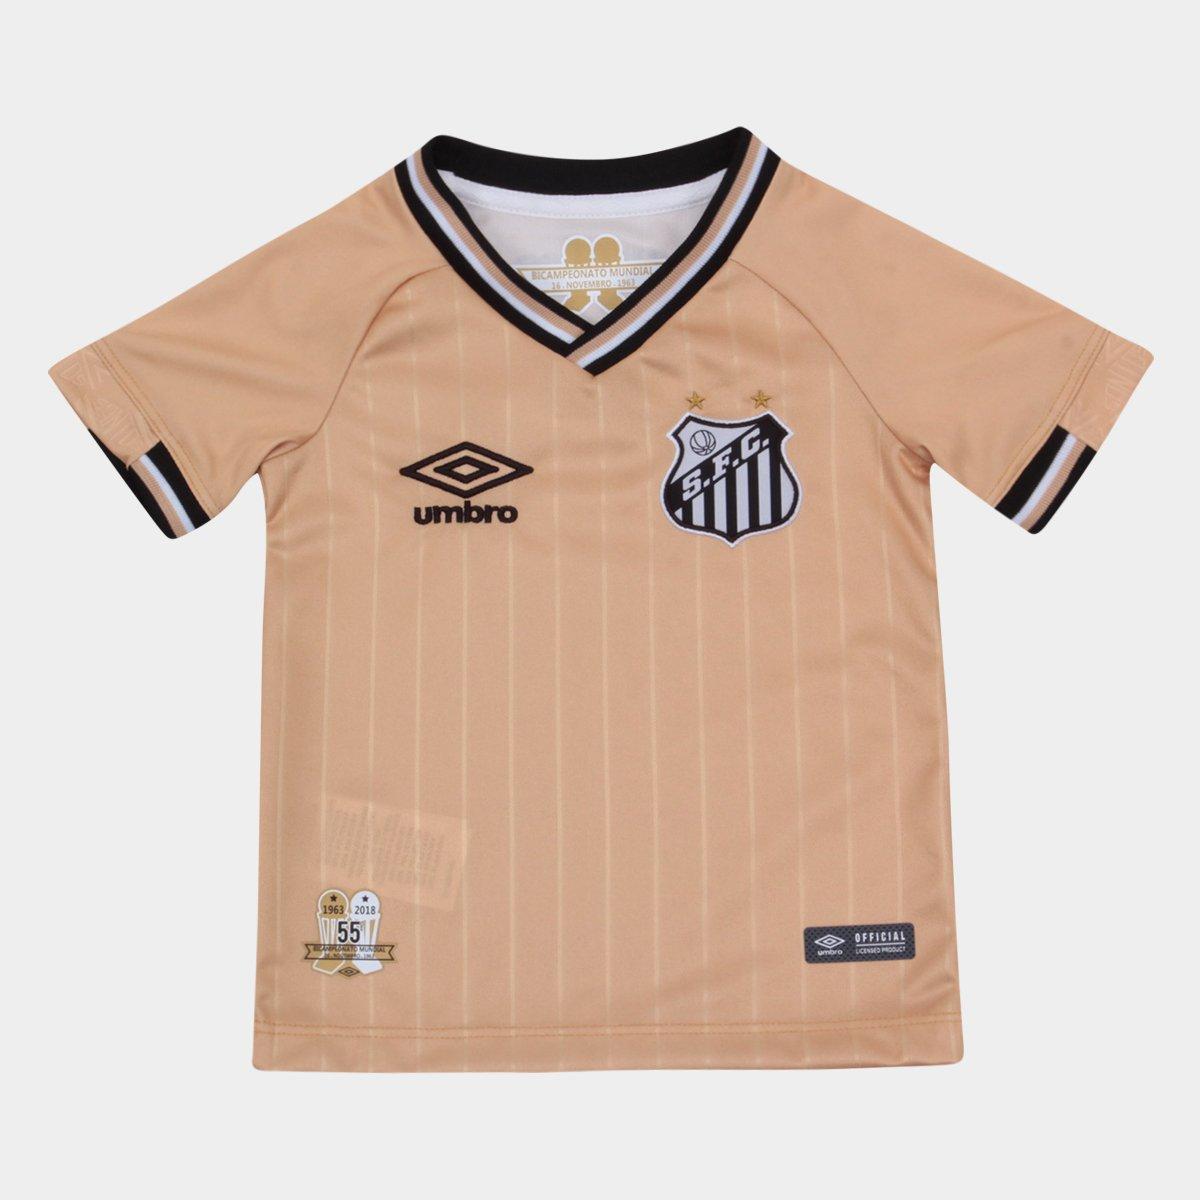 1f1bcf0f92 Camisa Santos Infantil III 2018 s n° - Torcedor Umbro - Dourado ...